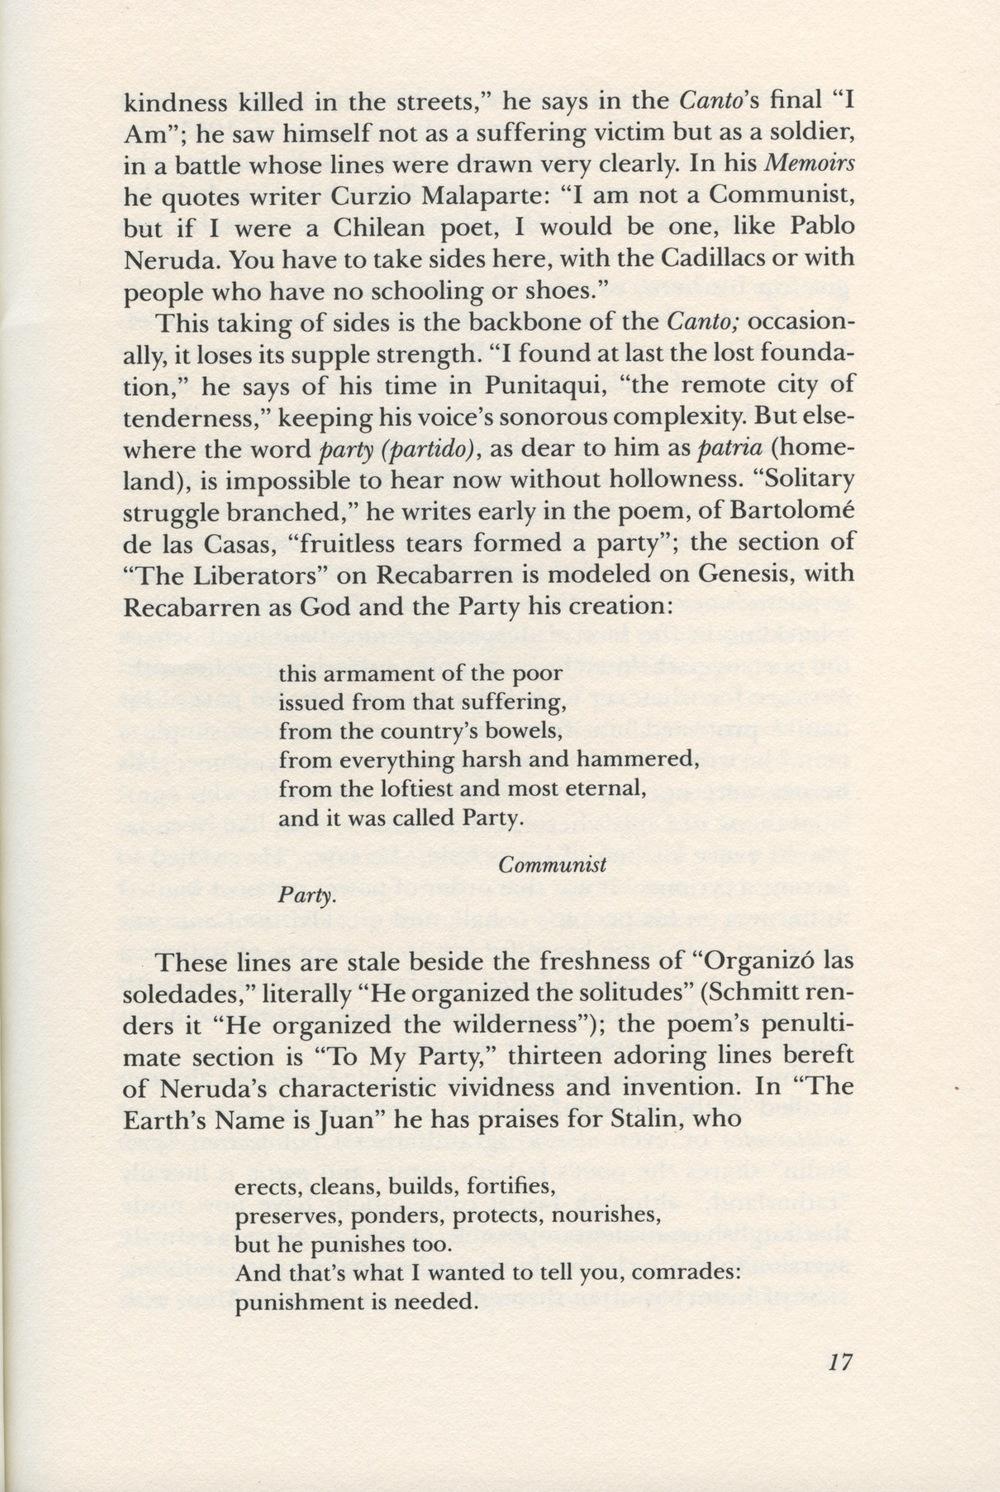 Neruda 11.jpeg